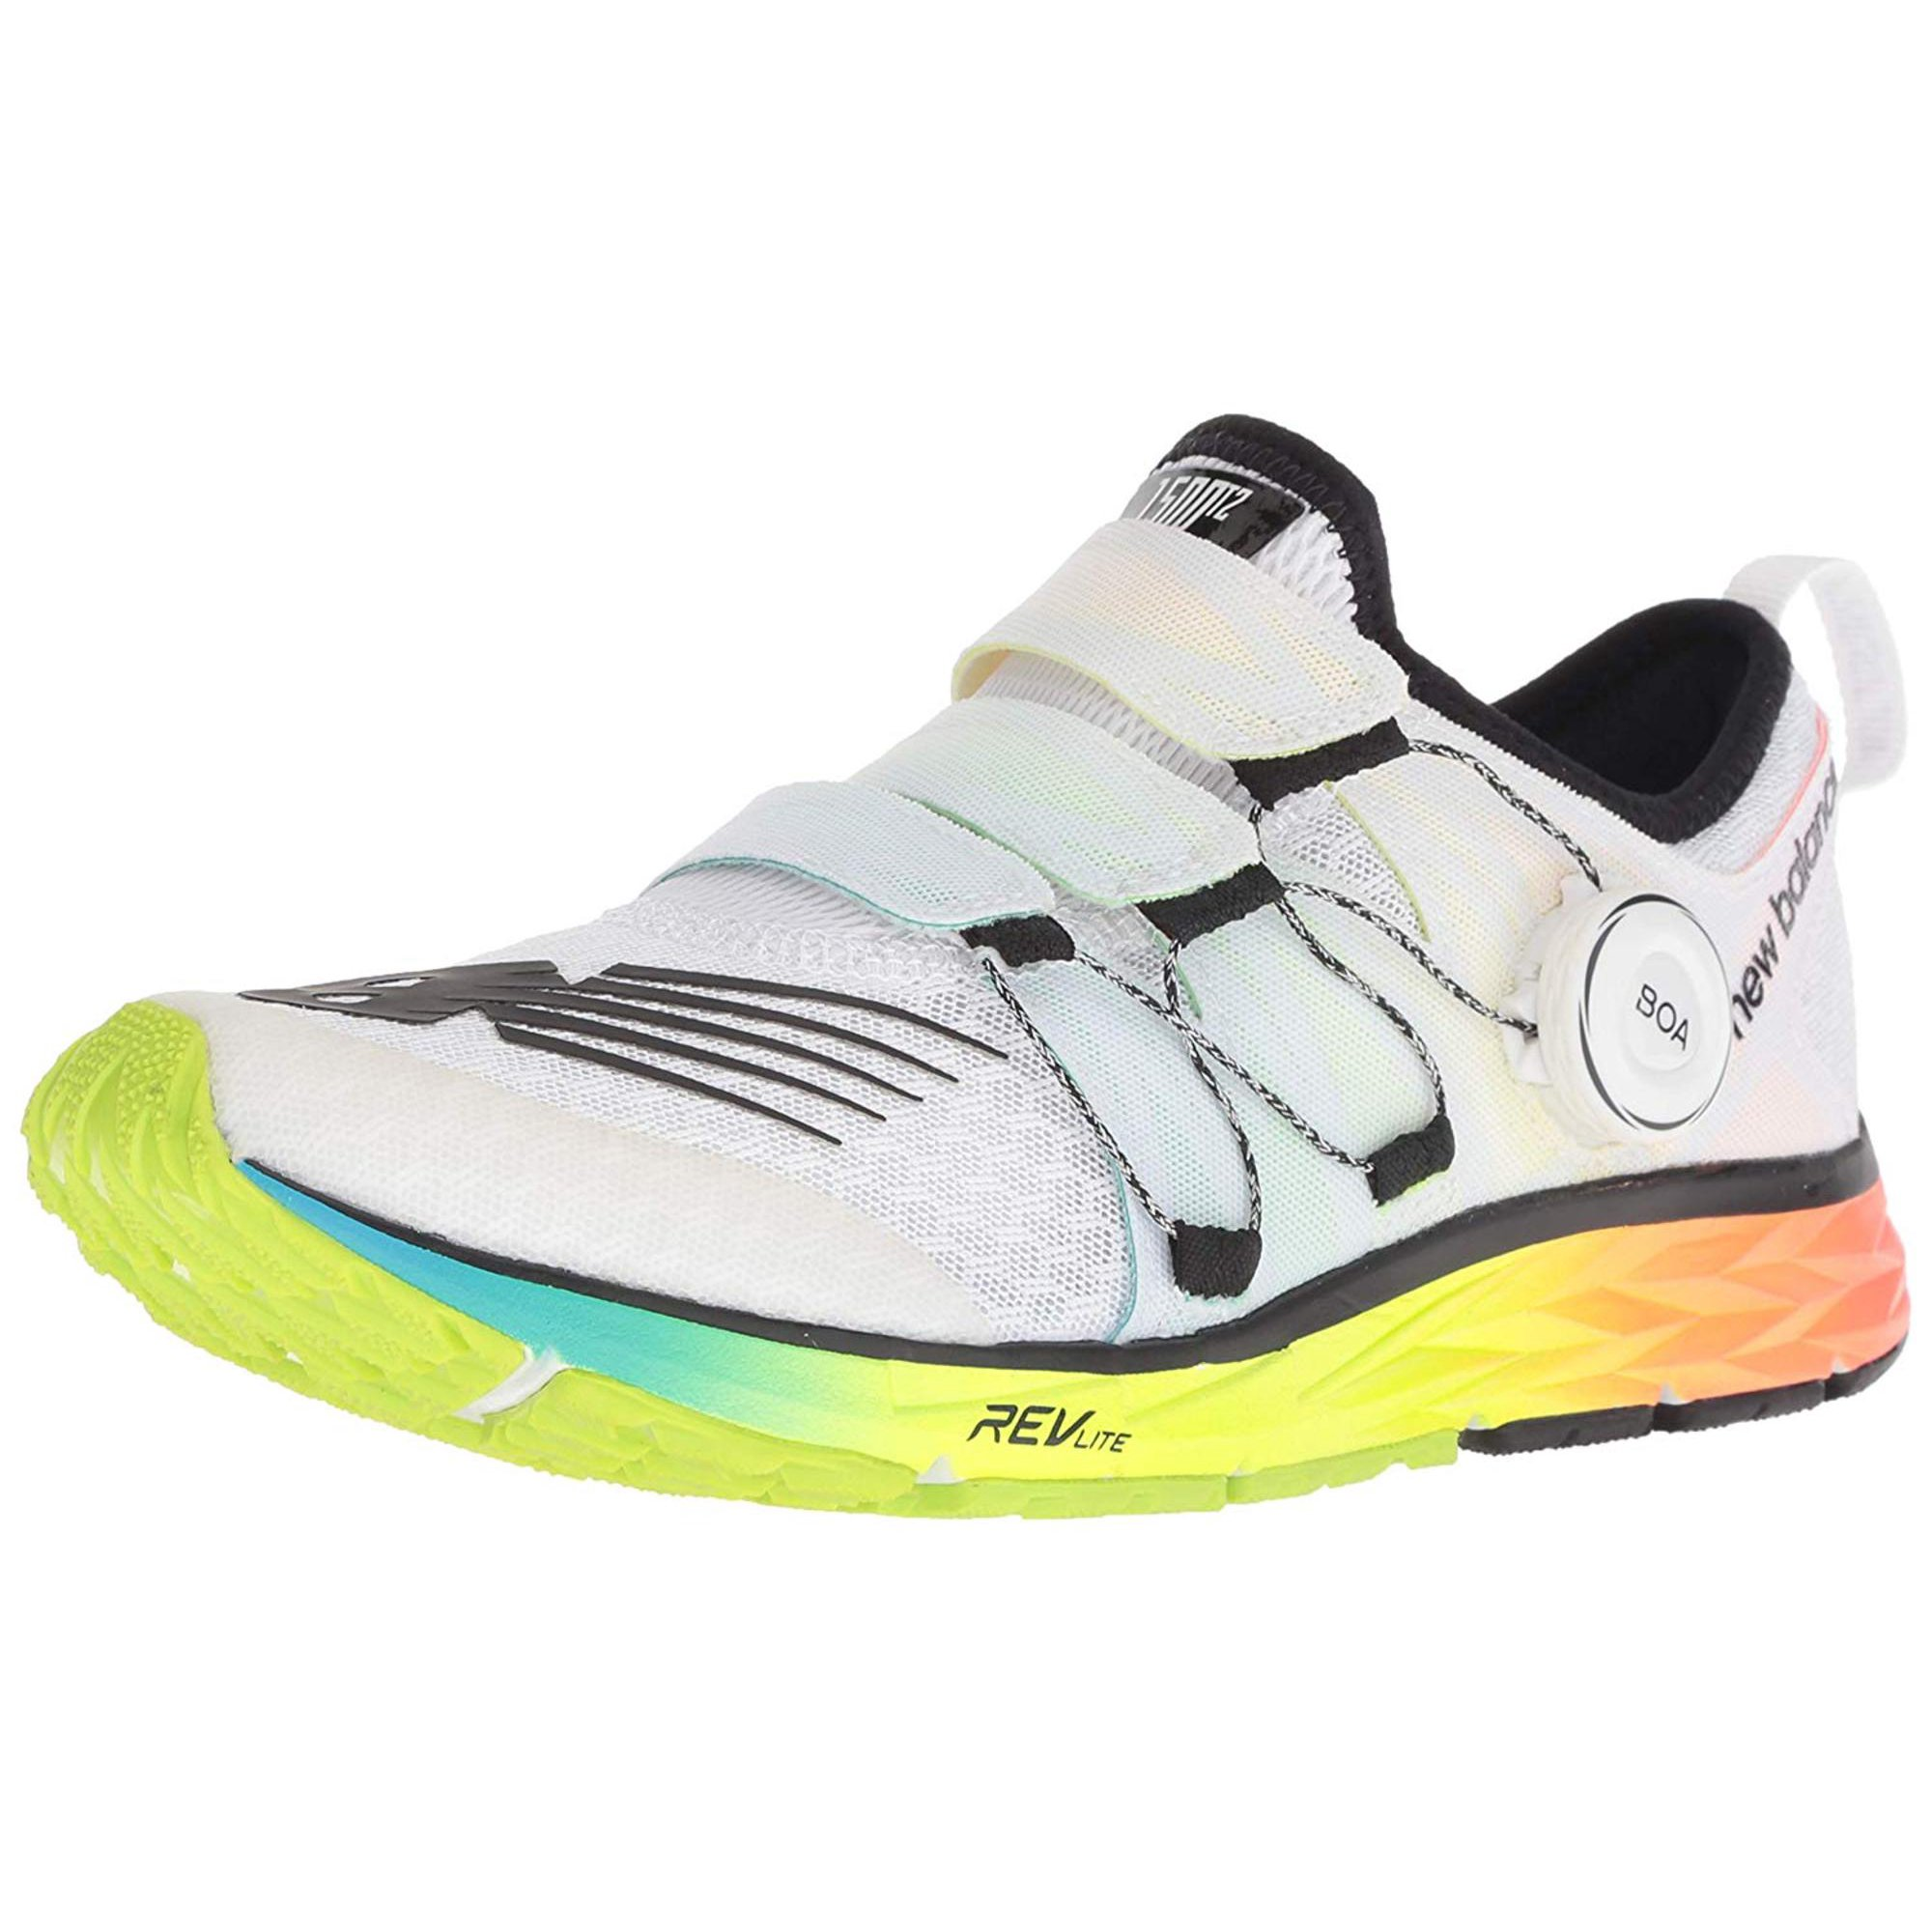 derrochador maravilloso pistón  New Balance Women's 1500v4 Running Shoe | Walmart Canada